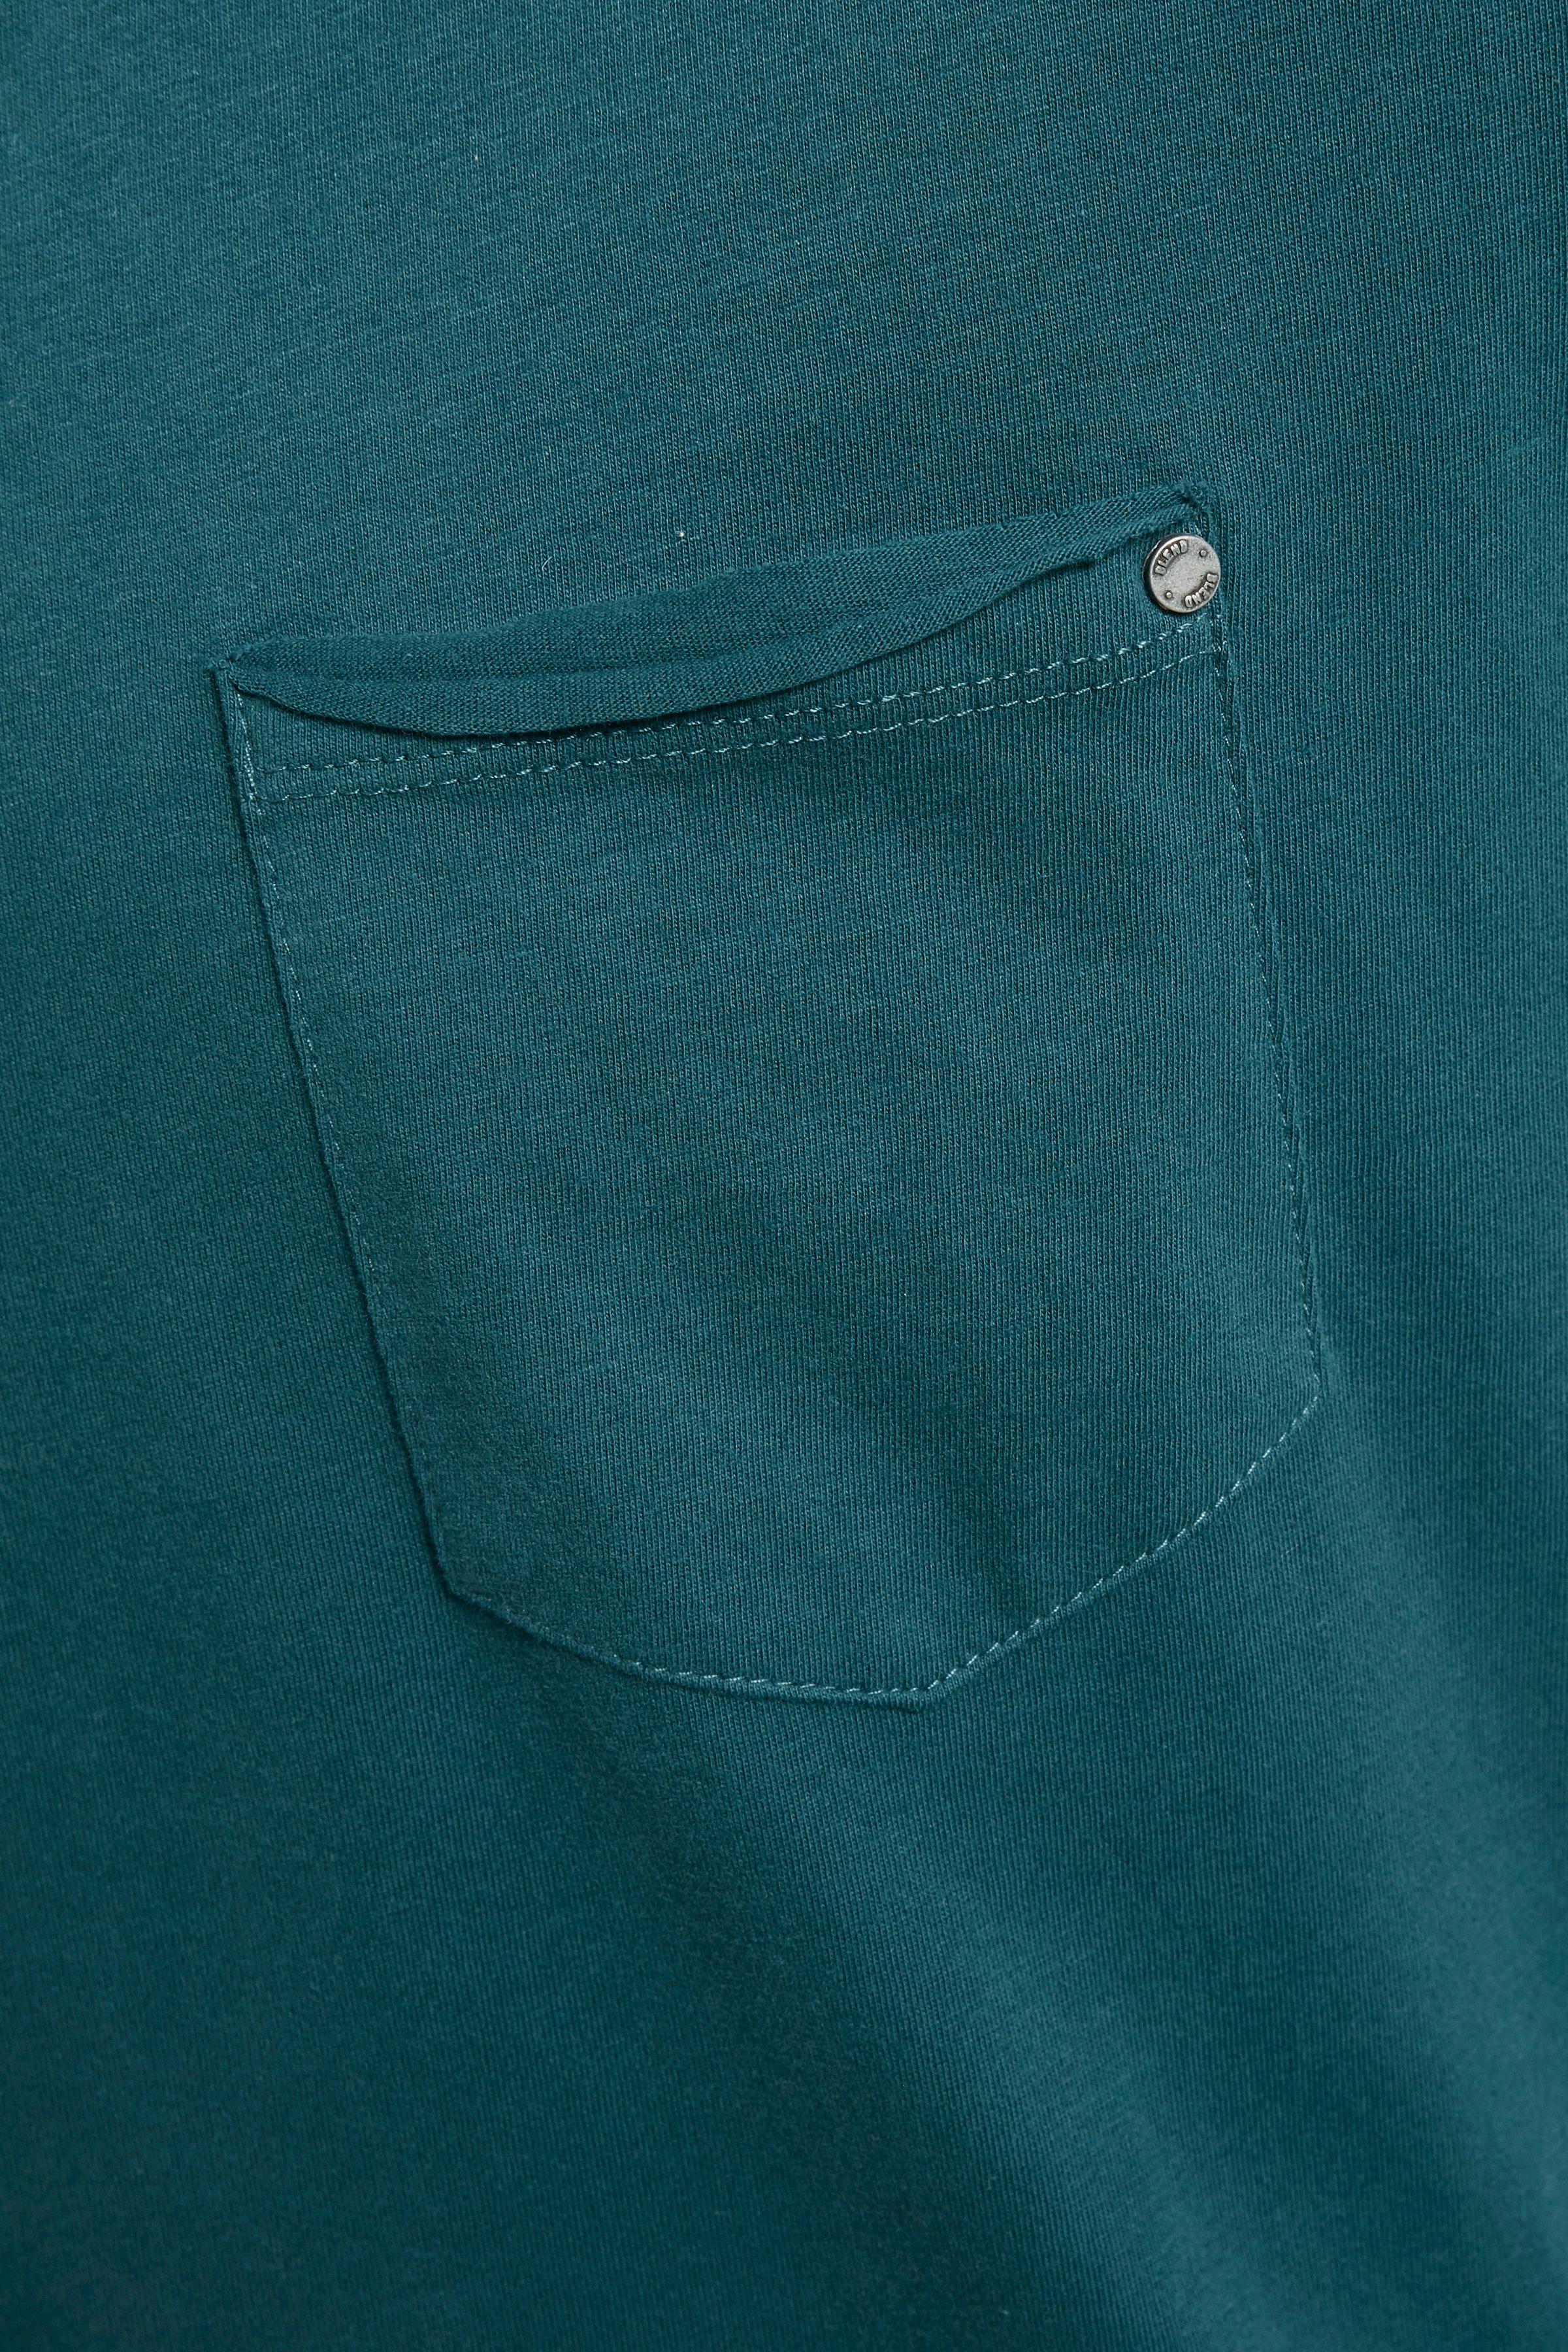 Majolica Blue T-shirt – Køb Majolica Blue T-shirt fra str. S-XXL her